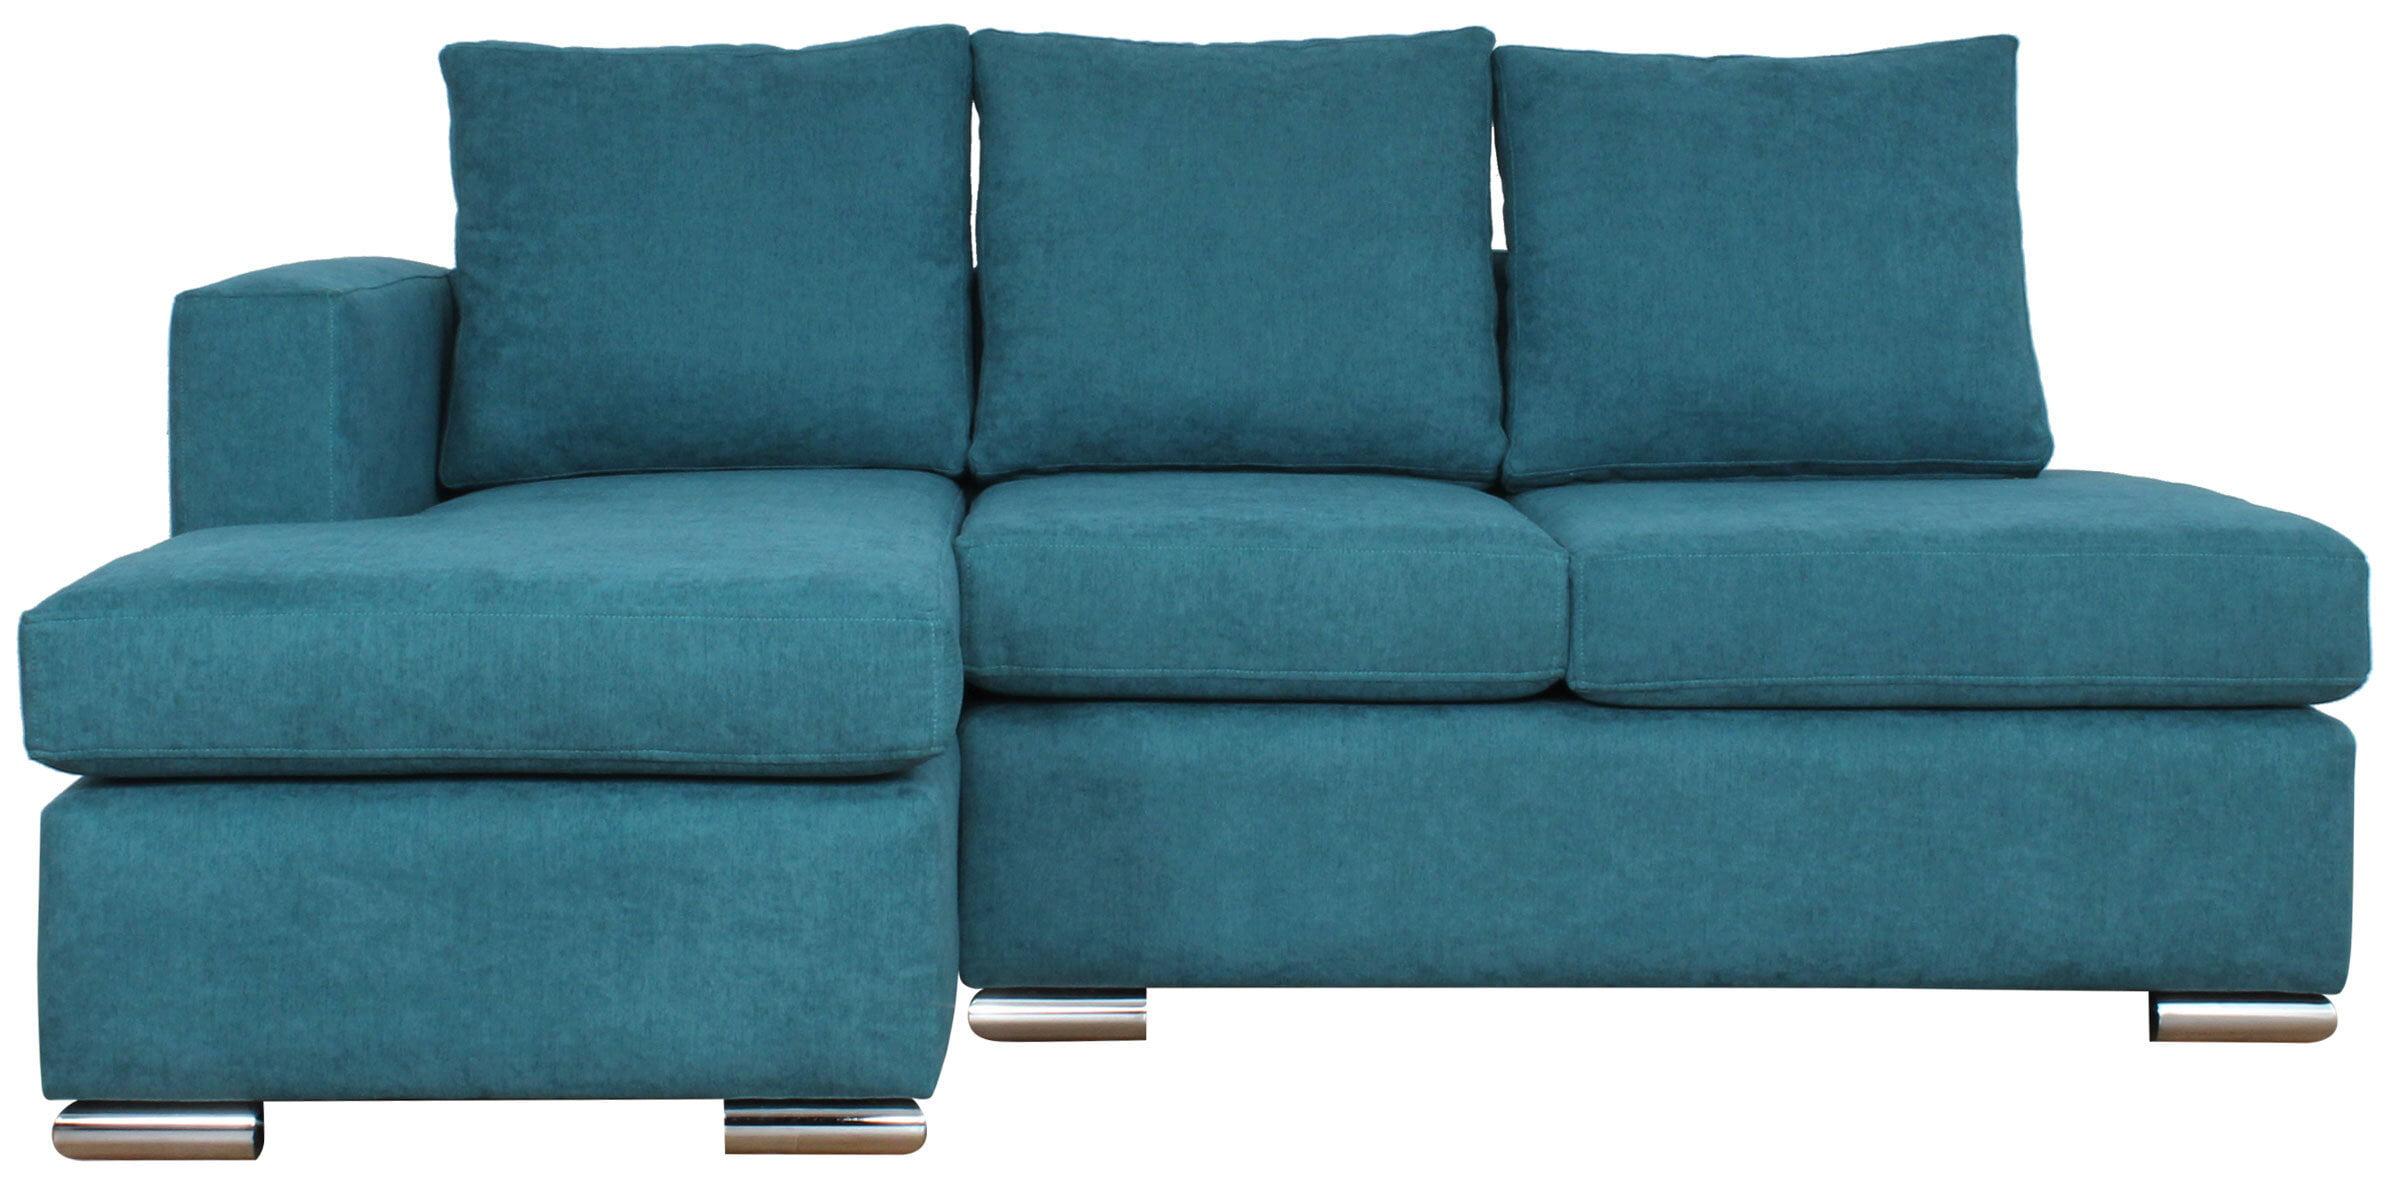 Sofa Modular Iz Mecha Pata Metalica11